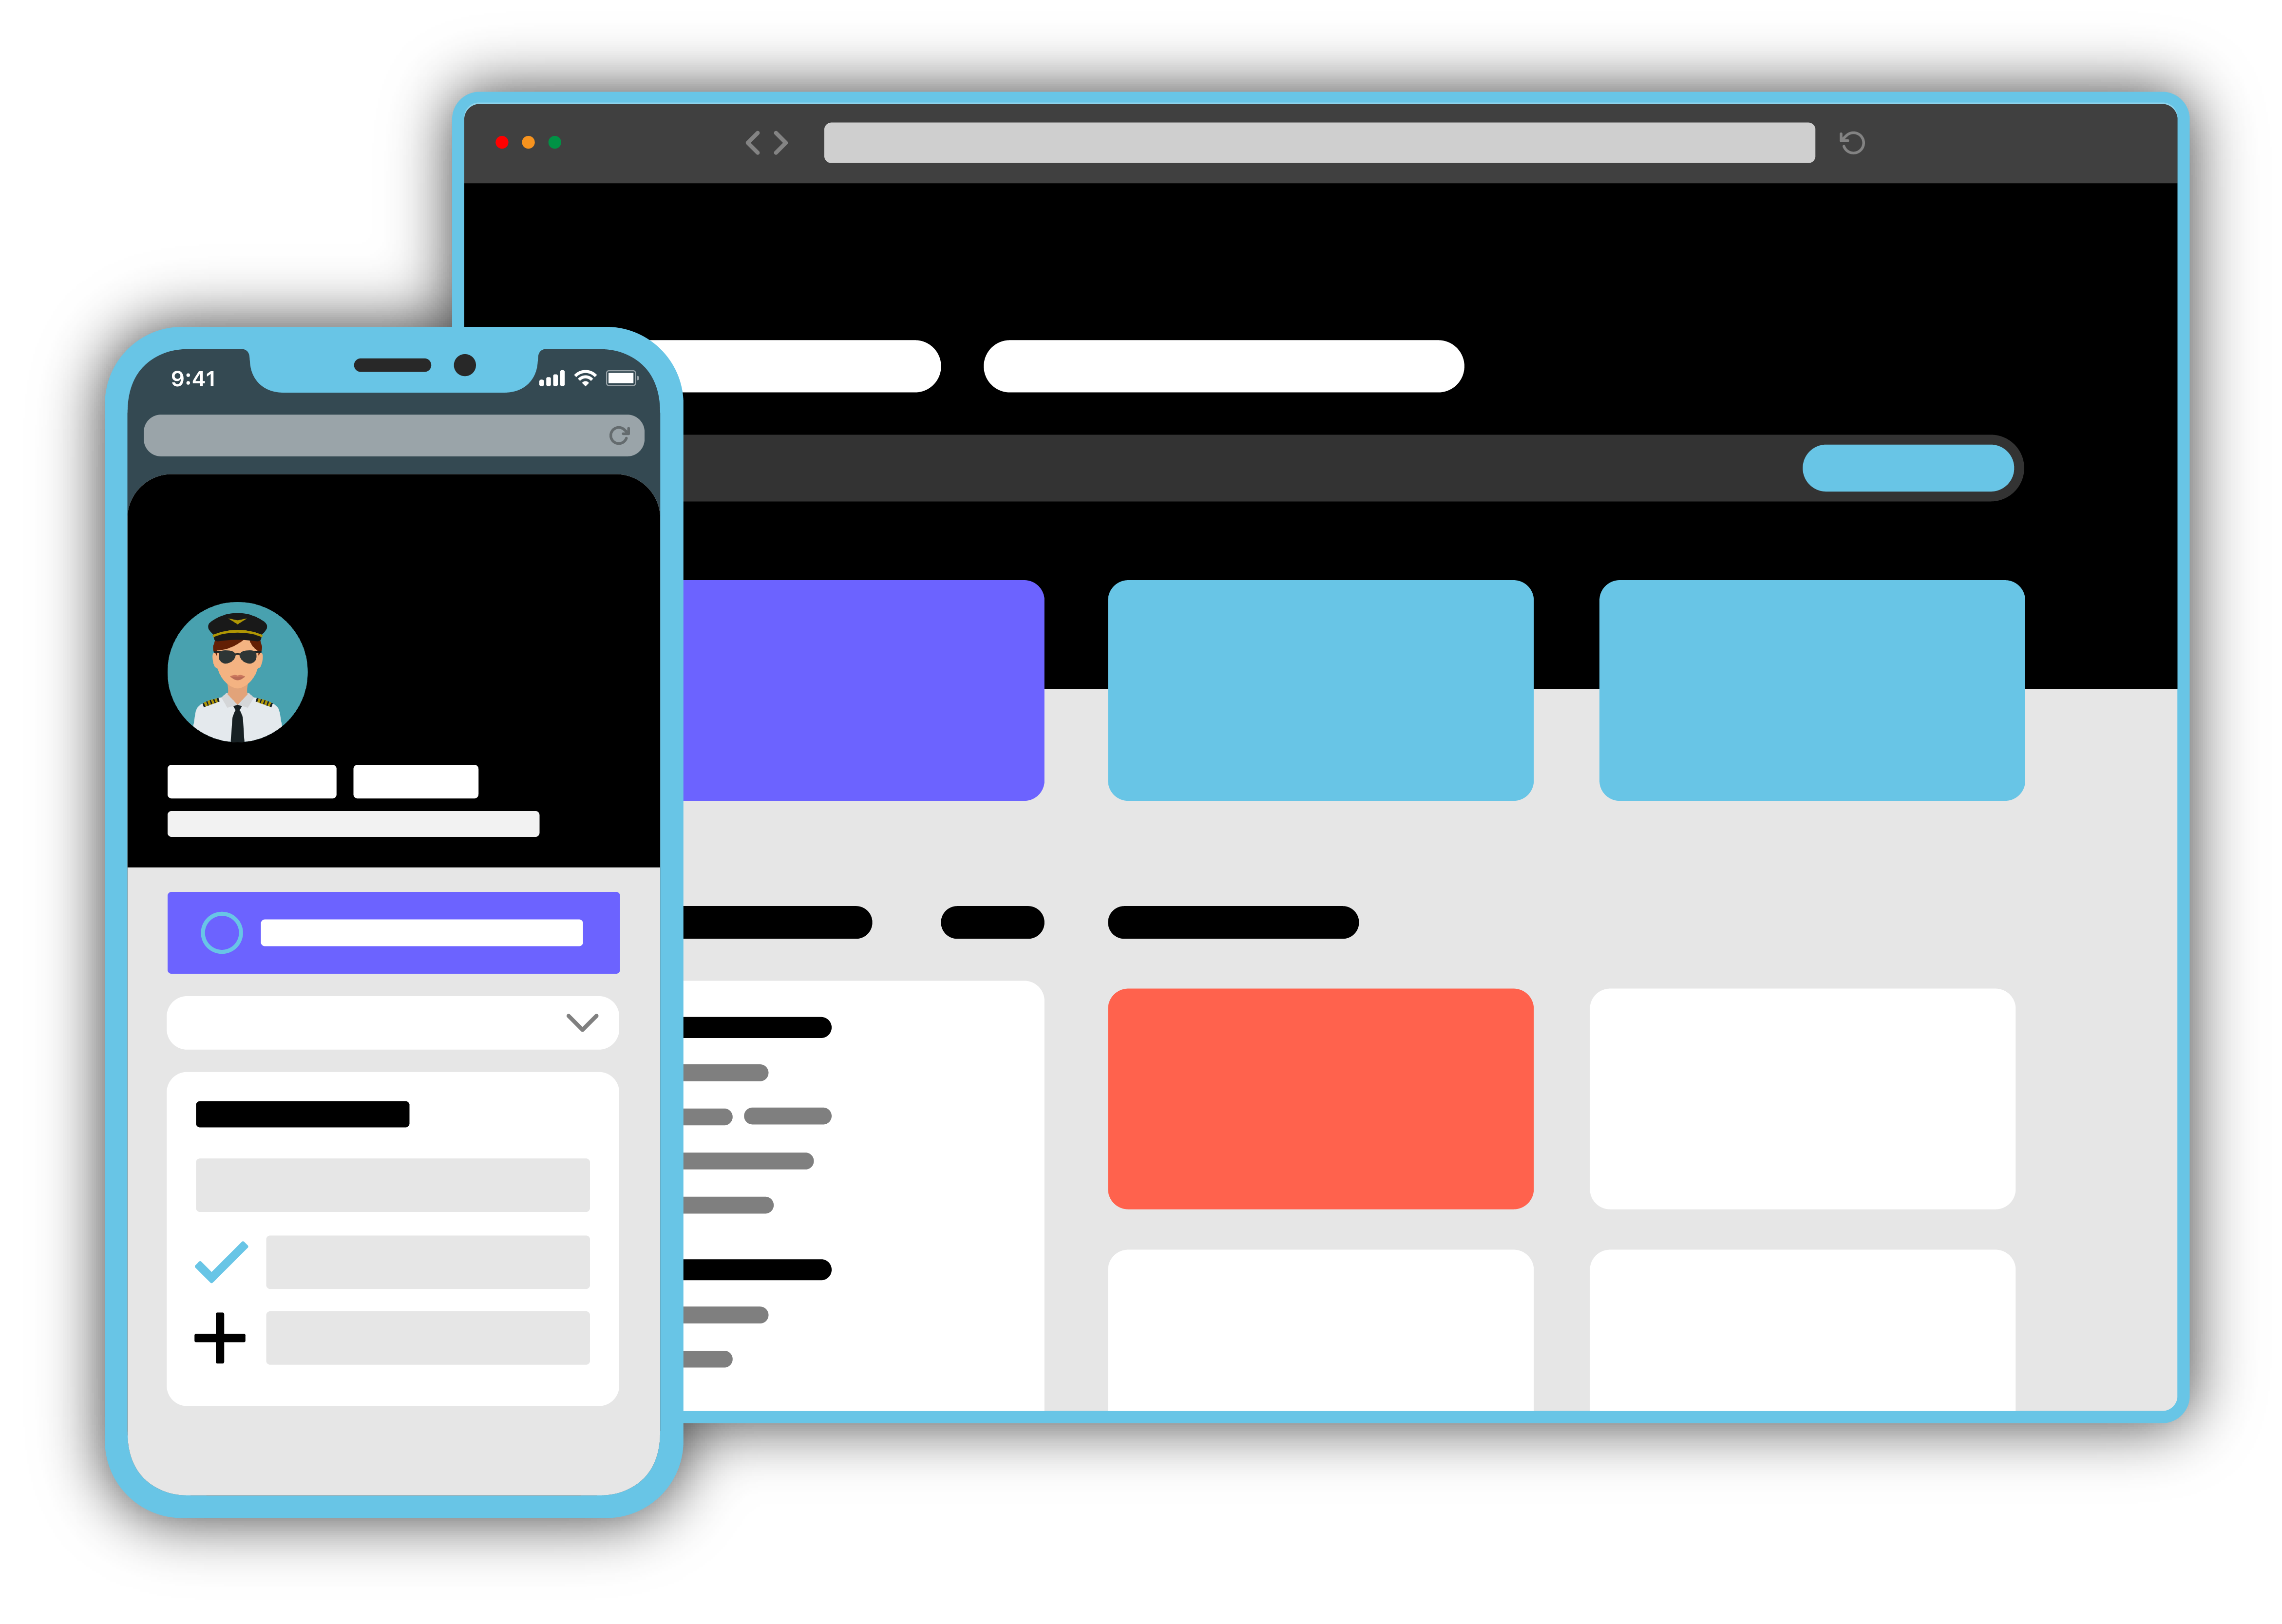 Pilotbase Pilot Job Board Graphic for Desktop and Mobile